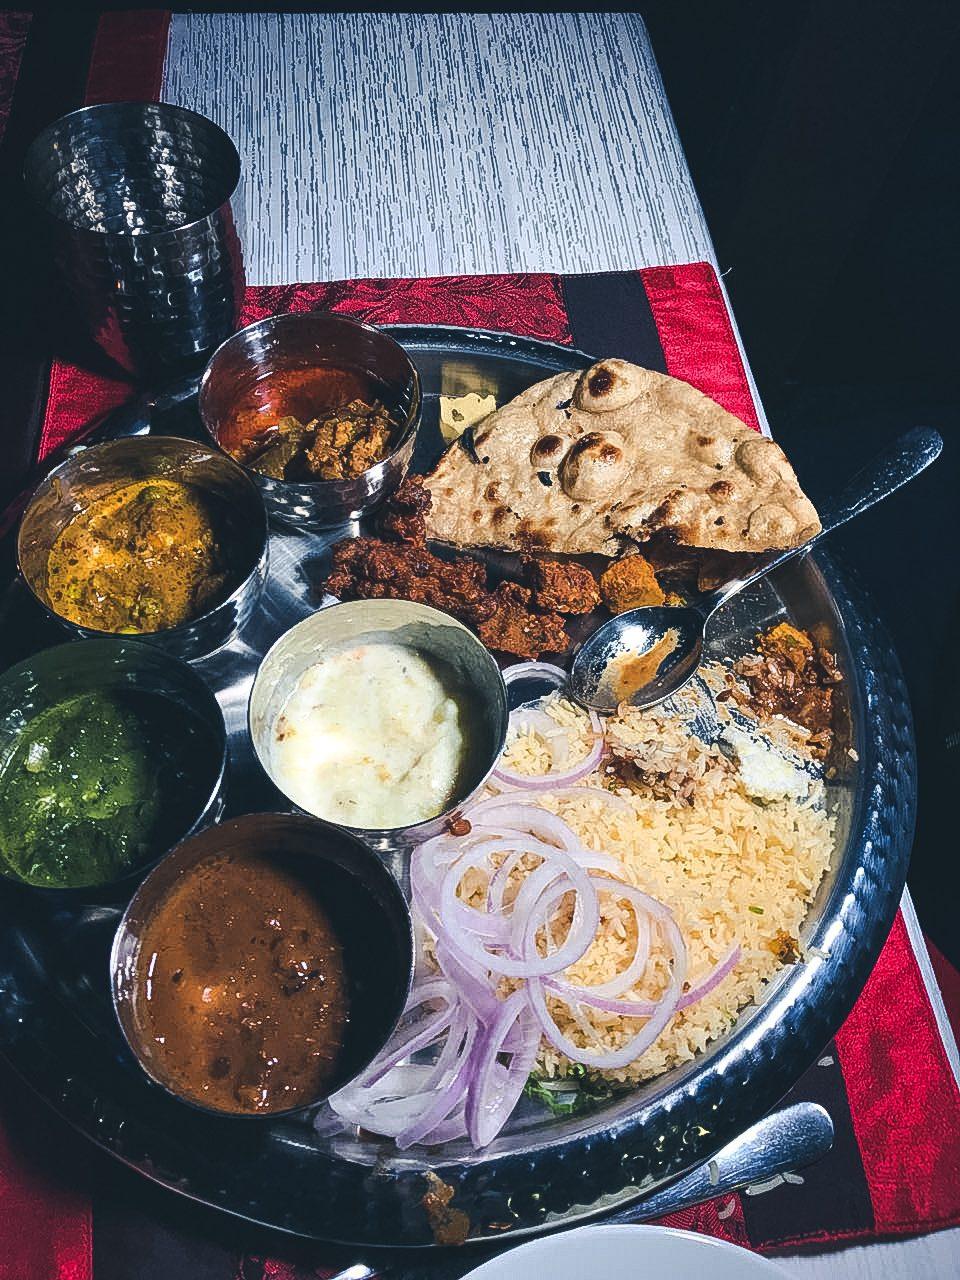 Garwhali Thali in Sterling Resorts